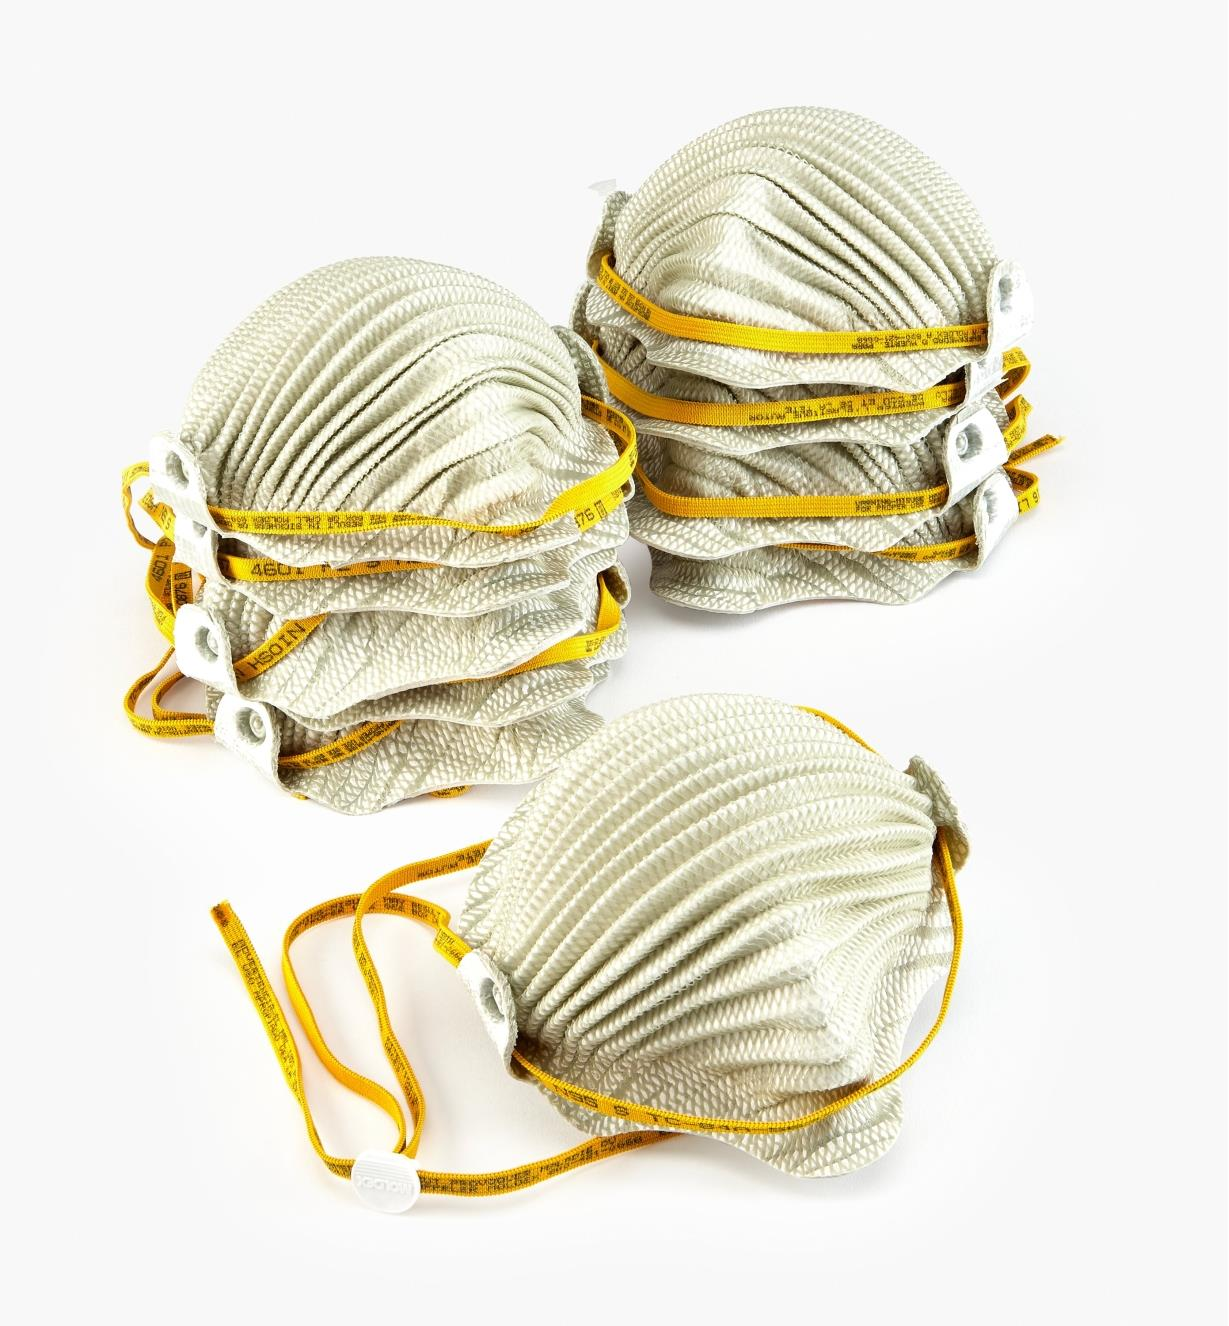 22R3611 - Airwave Adjustable-Strap Disposable Dust Masks, Small, pkg. of 10